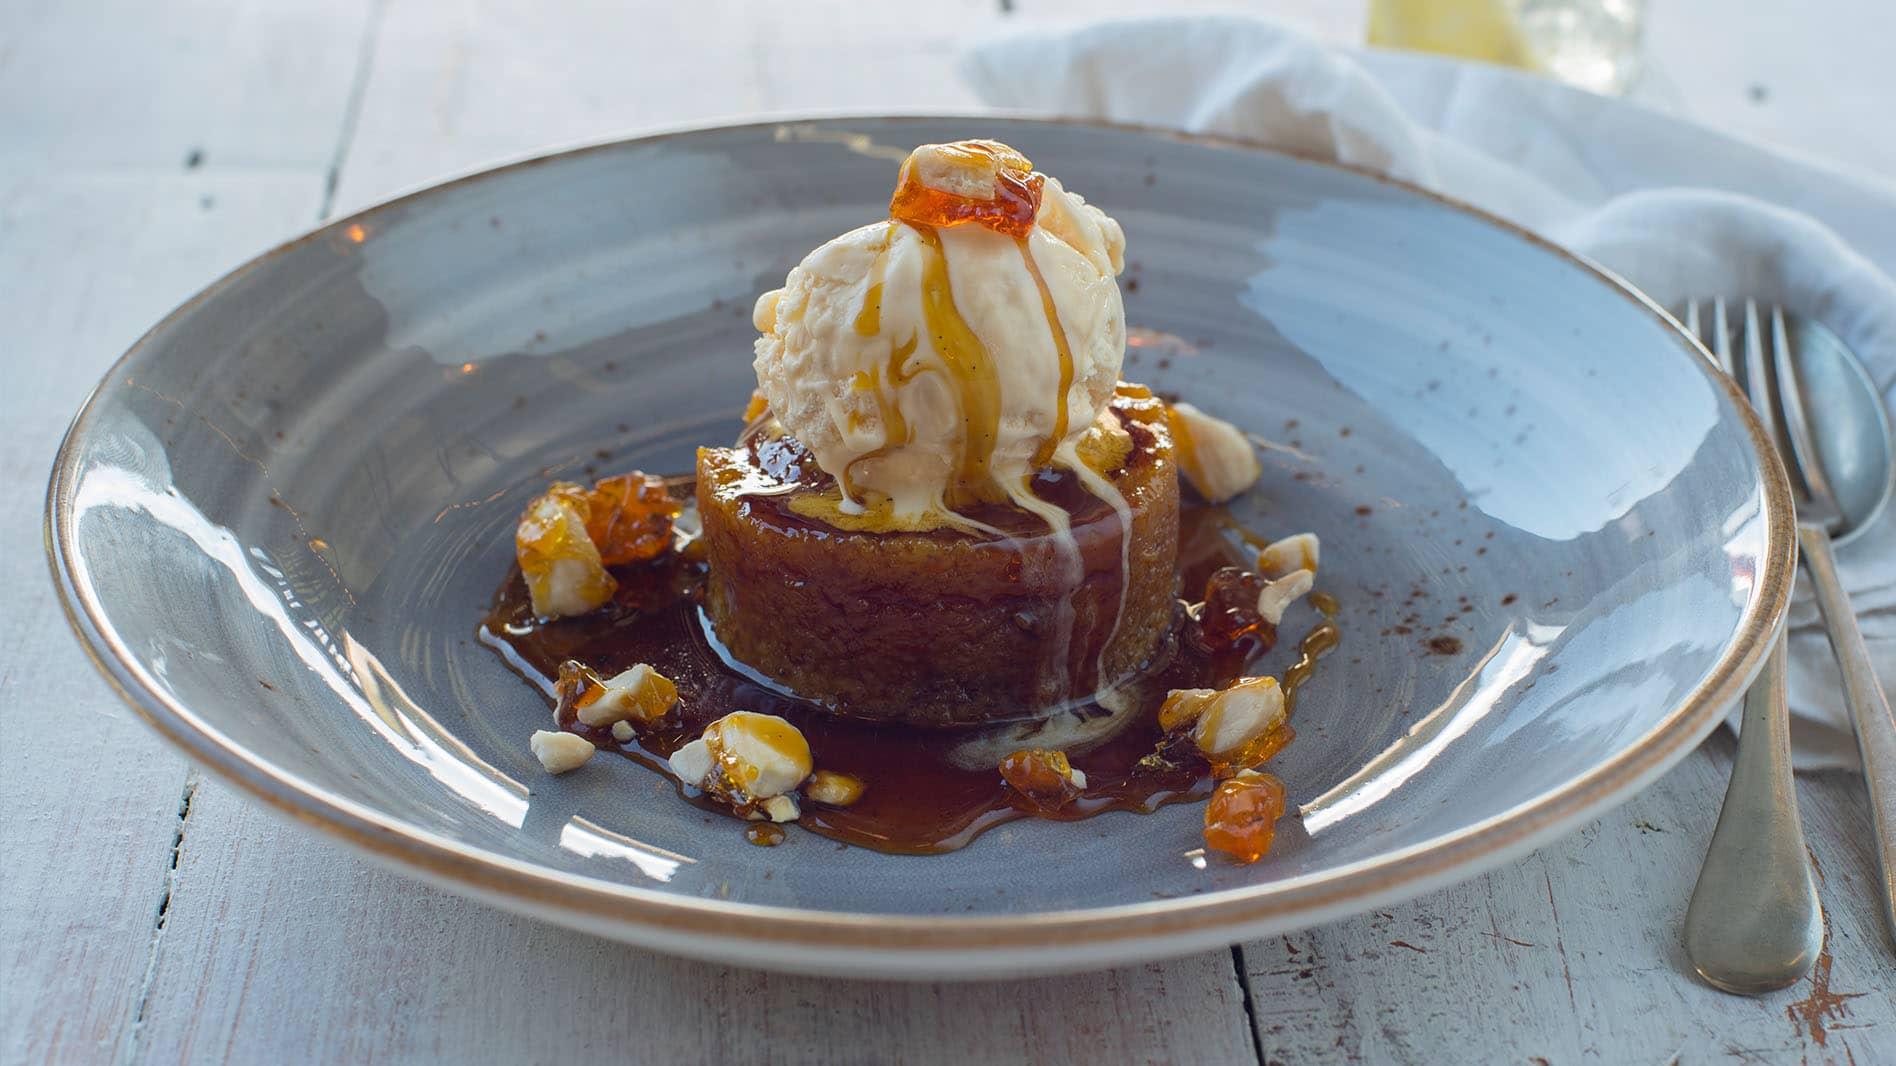 Steamed Golden Syrup Pudding